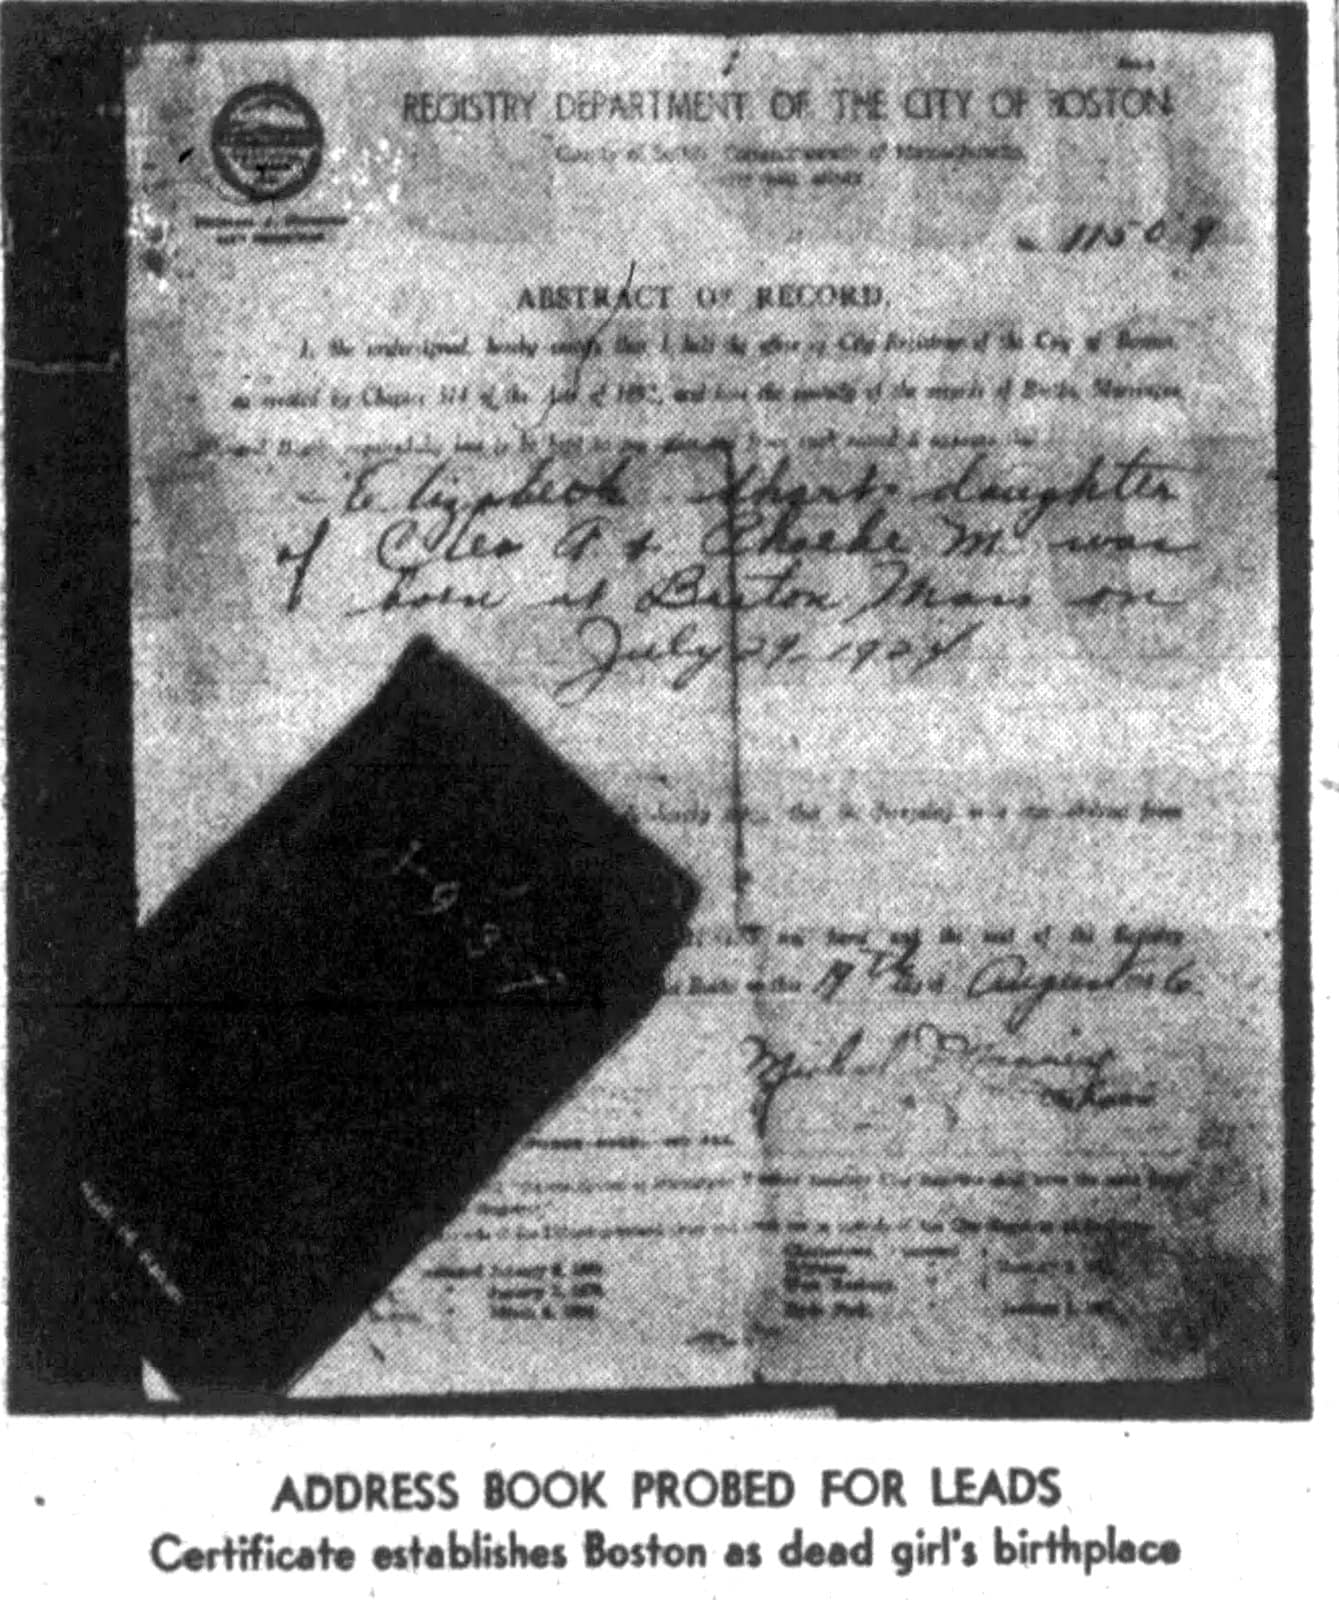 Elizabeth Short birth certificate